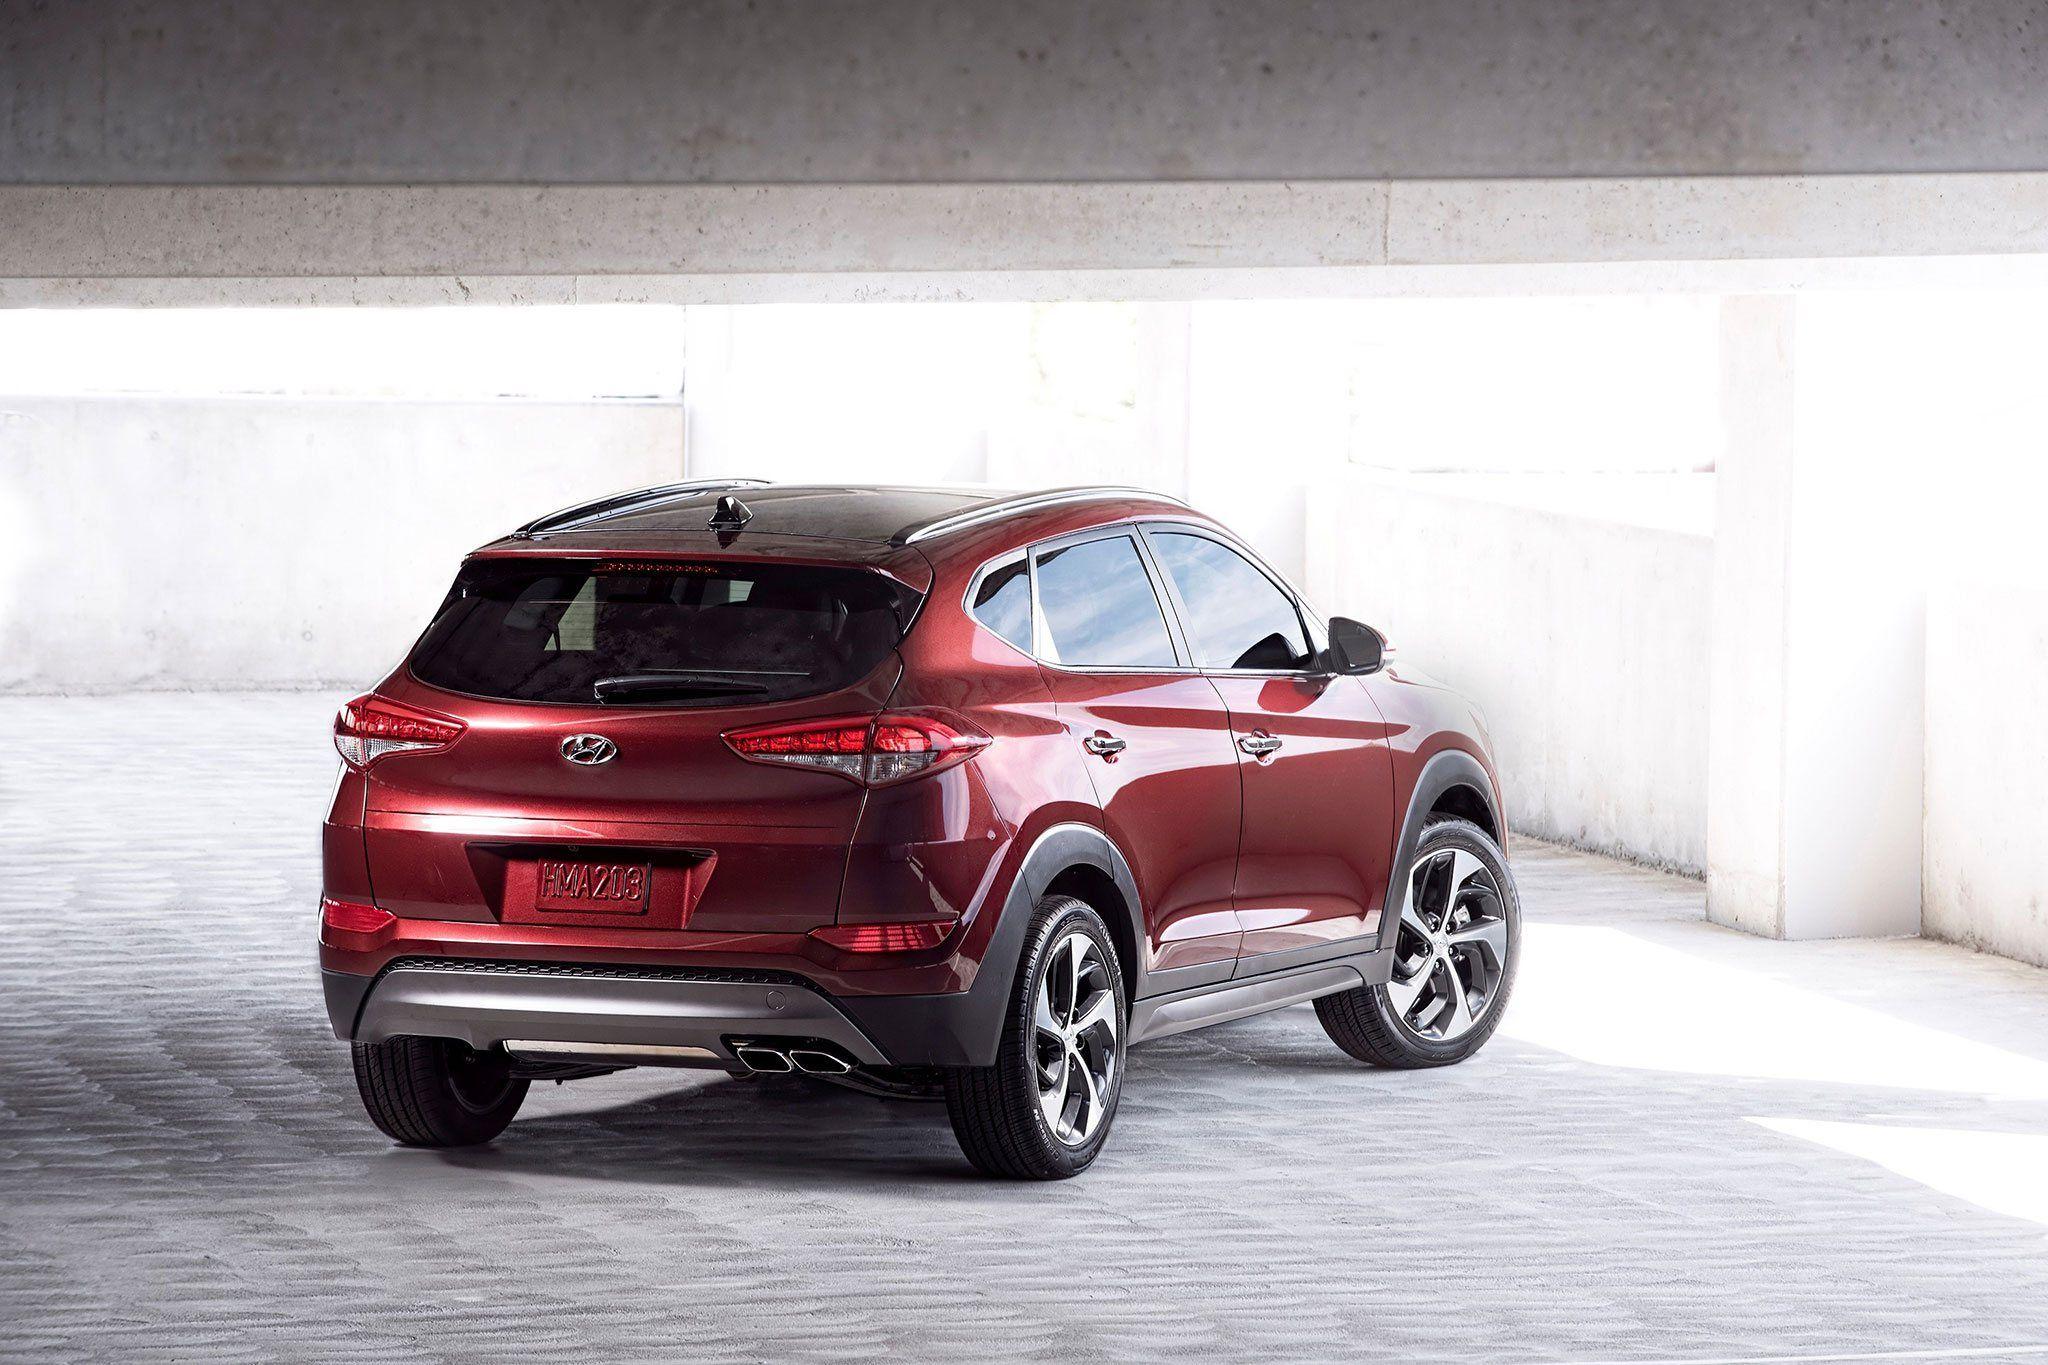 2021 Hyundai Ix35 Ratings In 2020 Hyundai Tucson Hyundai Tucson